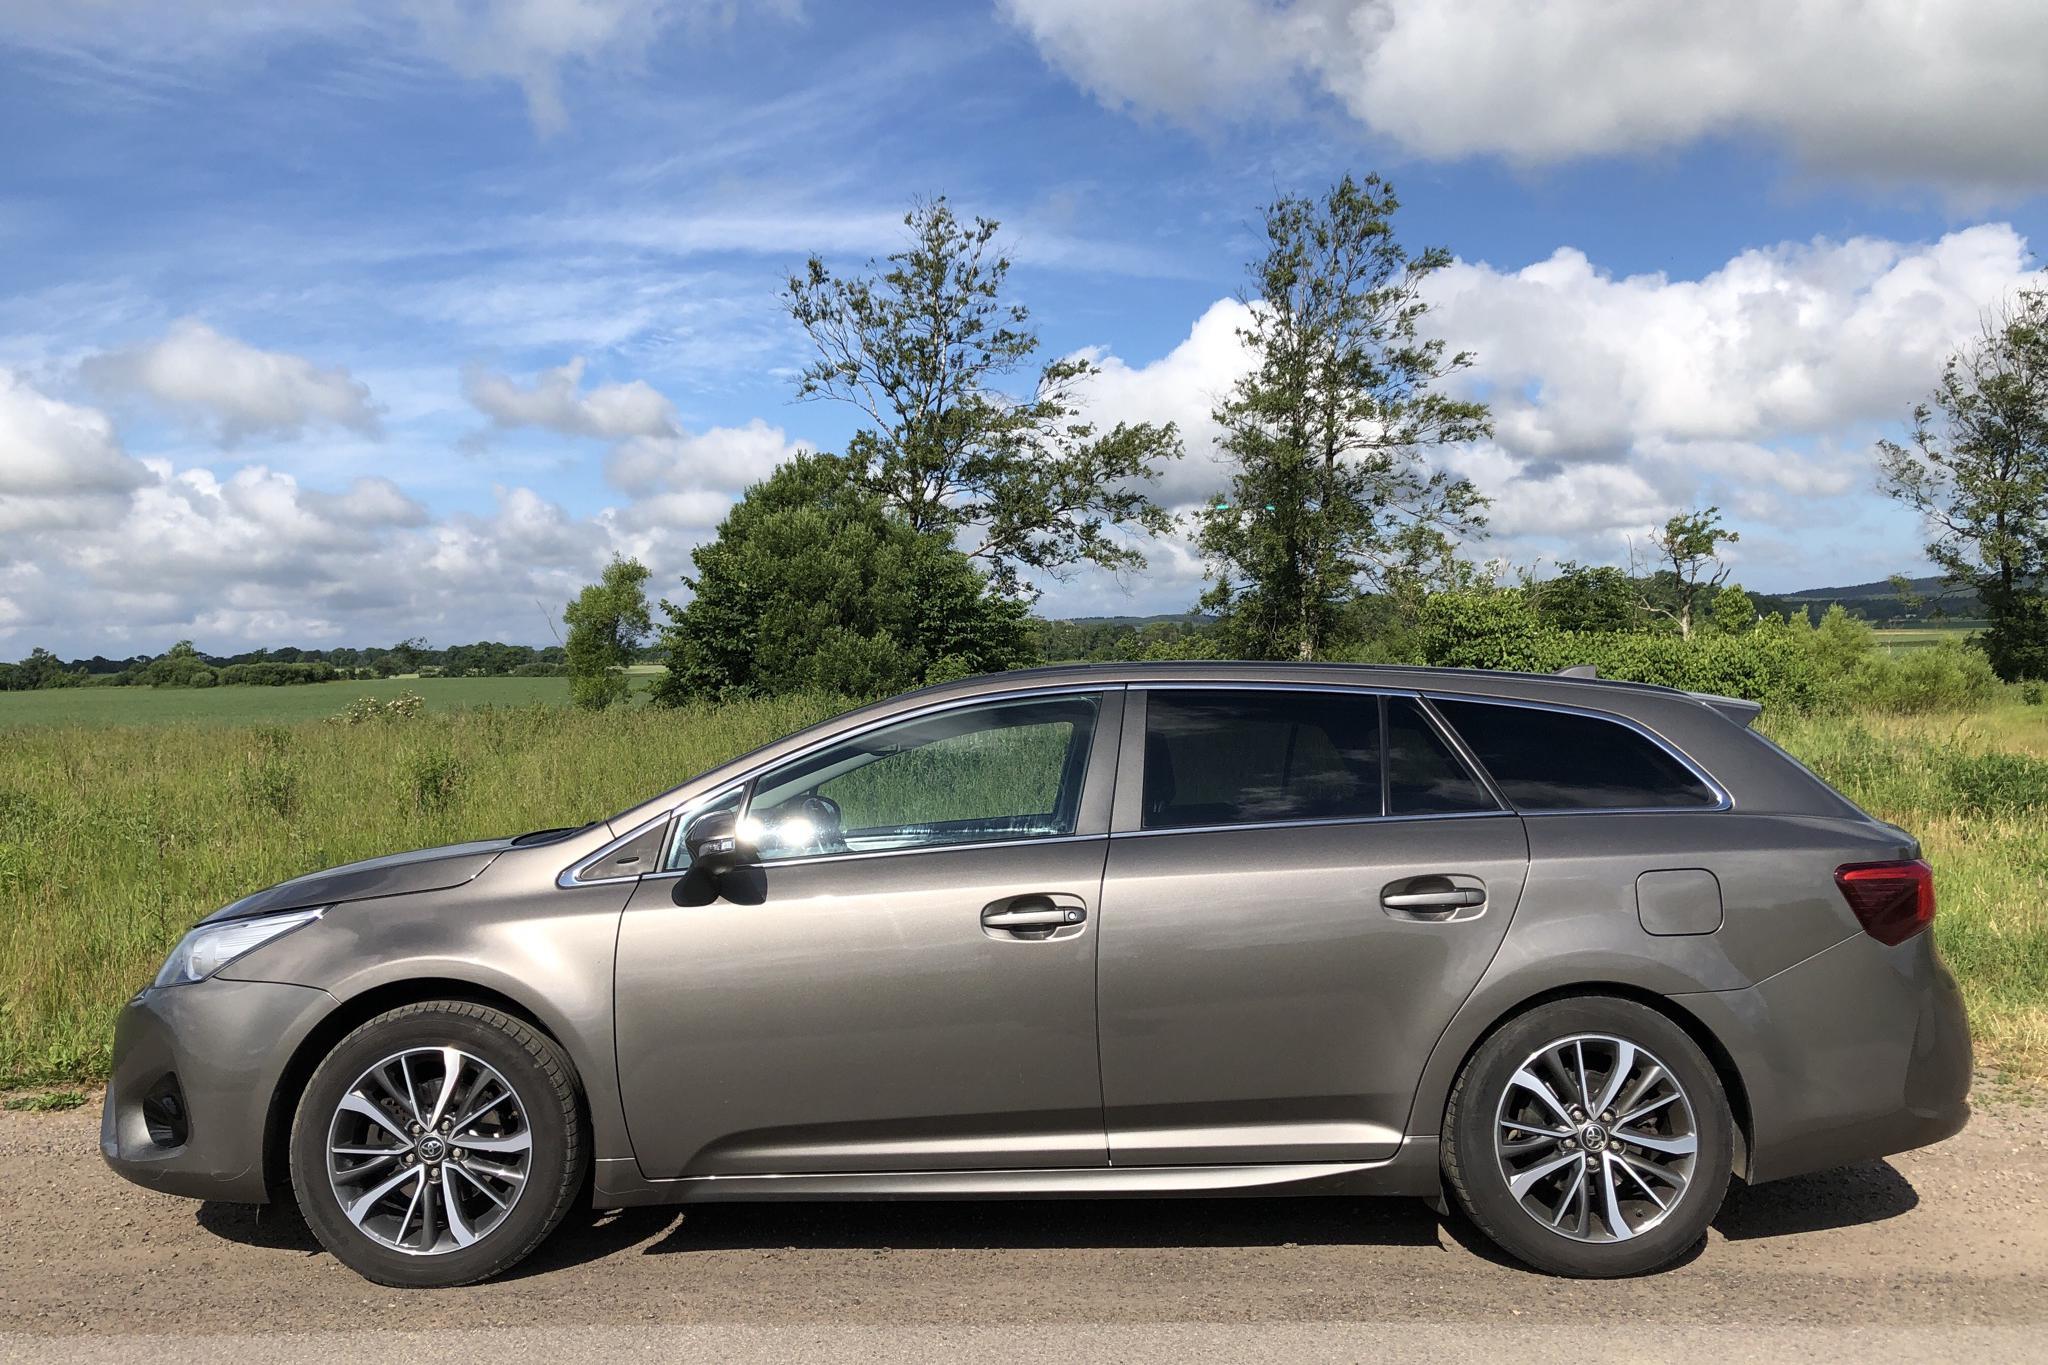 Toyota Avensis 1.8 Touring Sports (147hk) - 11 750 mil - Automat - Dark Grey - 2017